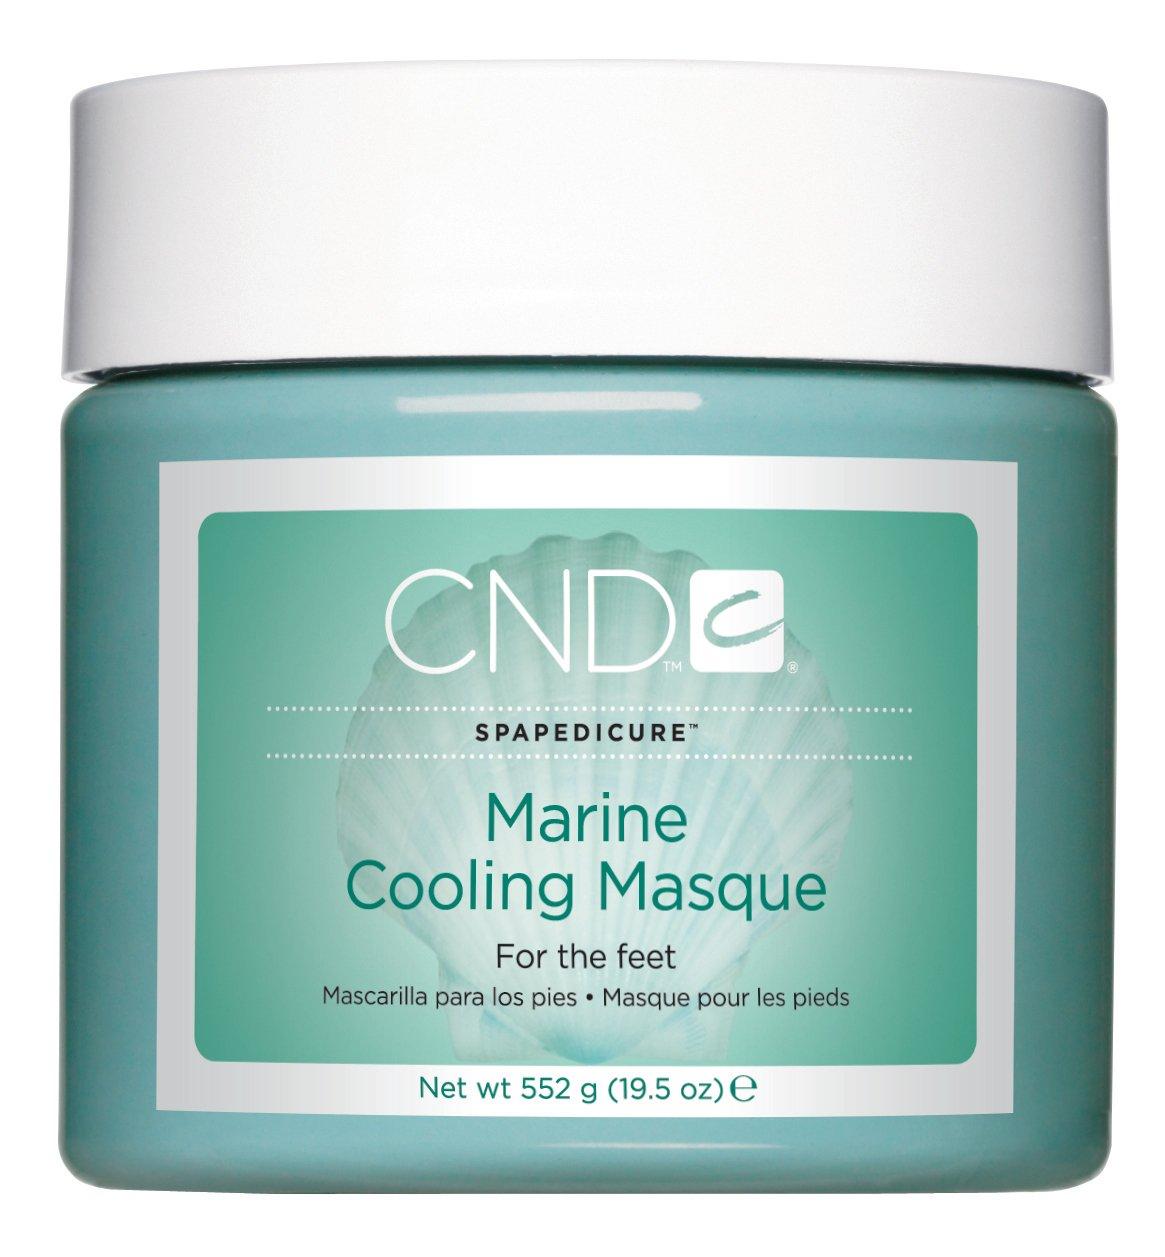 CND Marine Cooling Masque, 19.5 Fl Oz